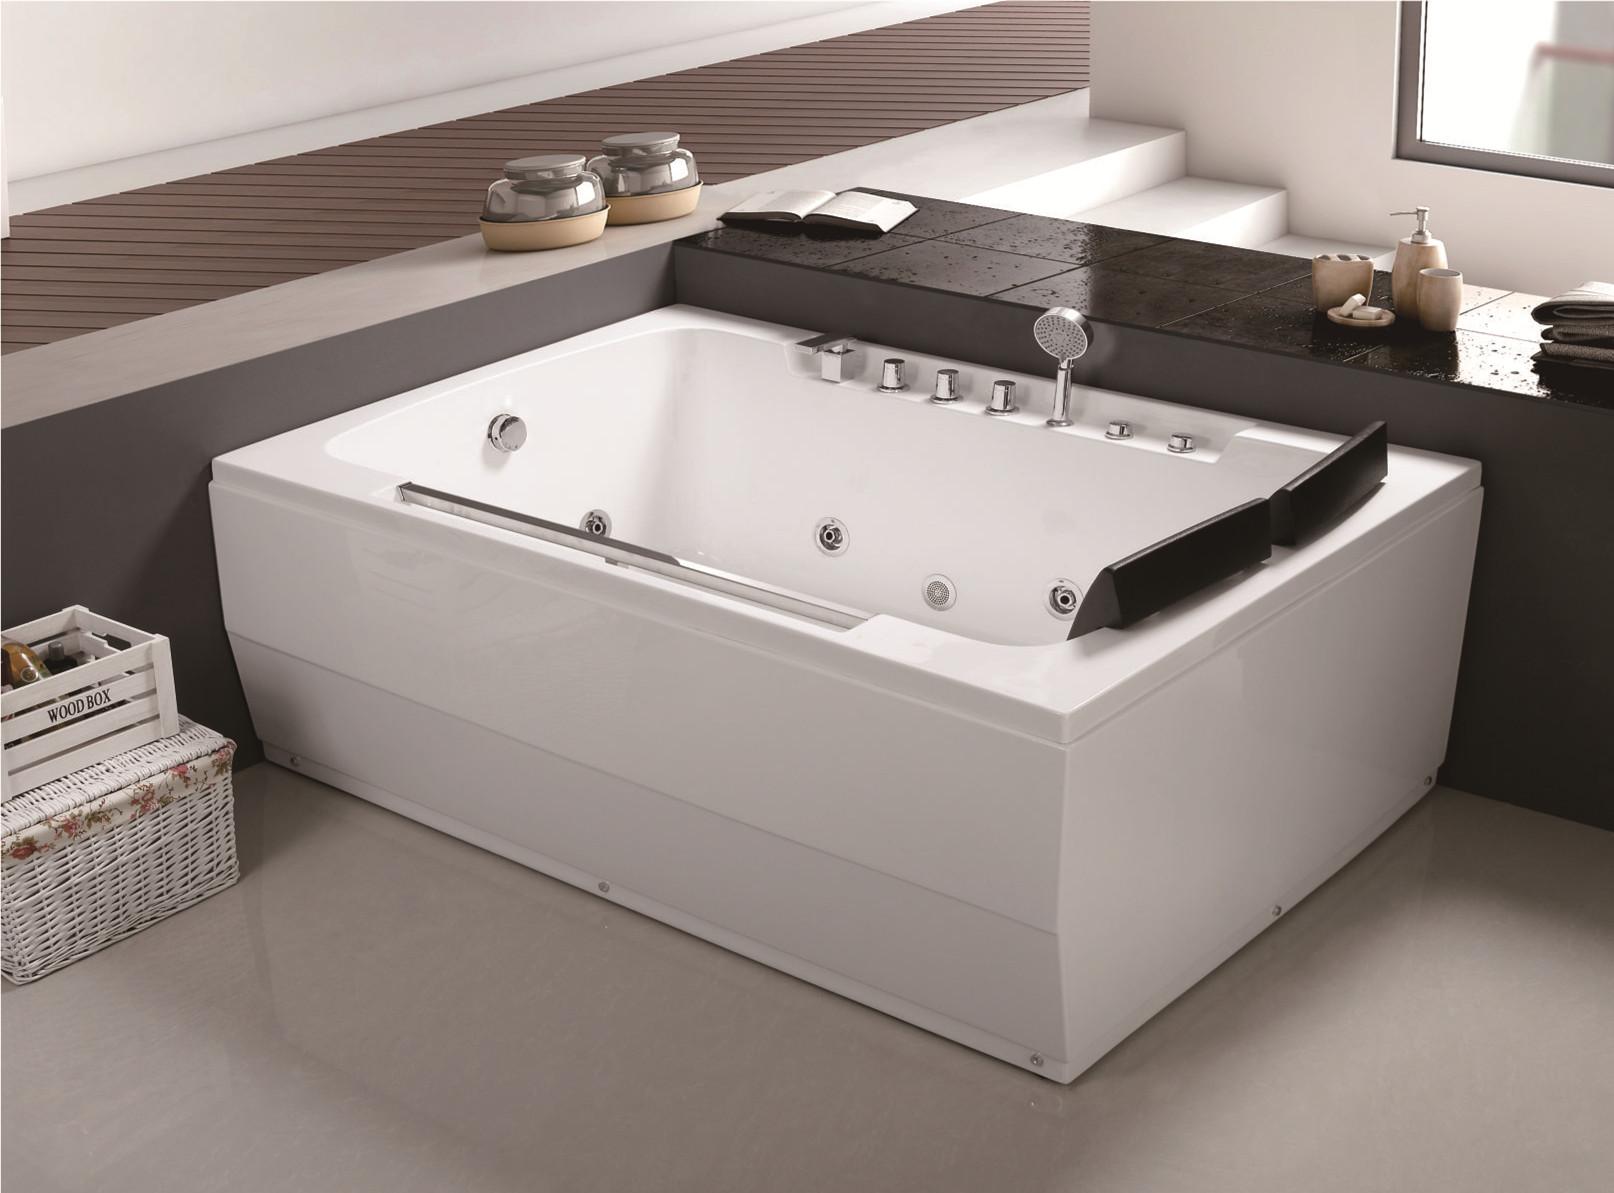 C-409 (C-3065) (R) Corner Luxury Hot Sale Tub  Massage Acrylic Bathroom Bathtub with Cheap Price.jpg